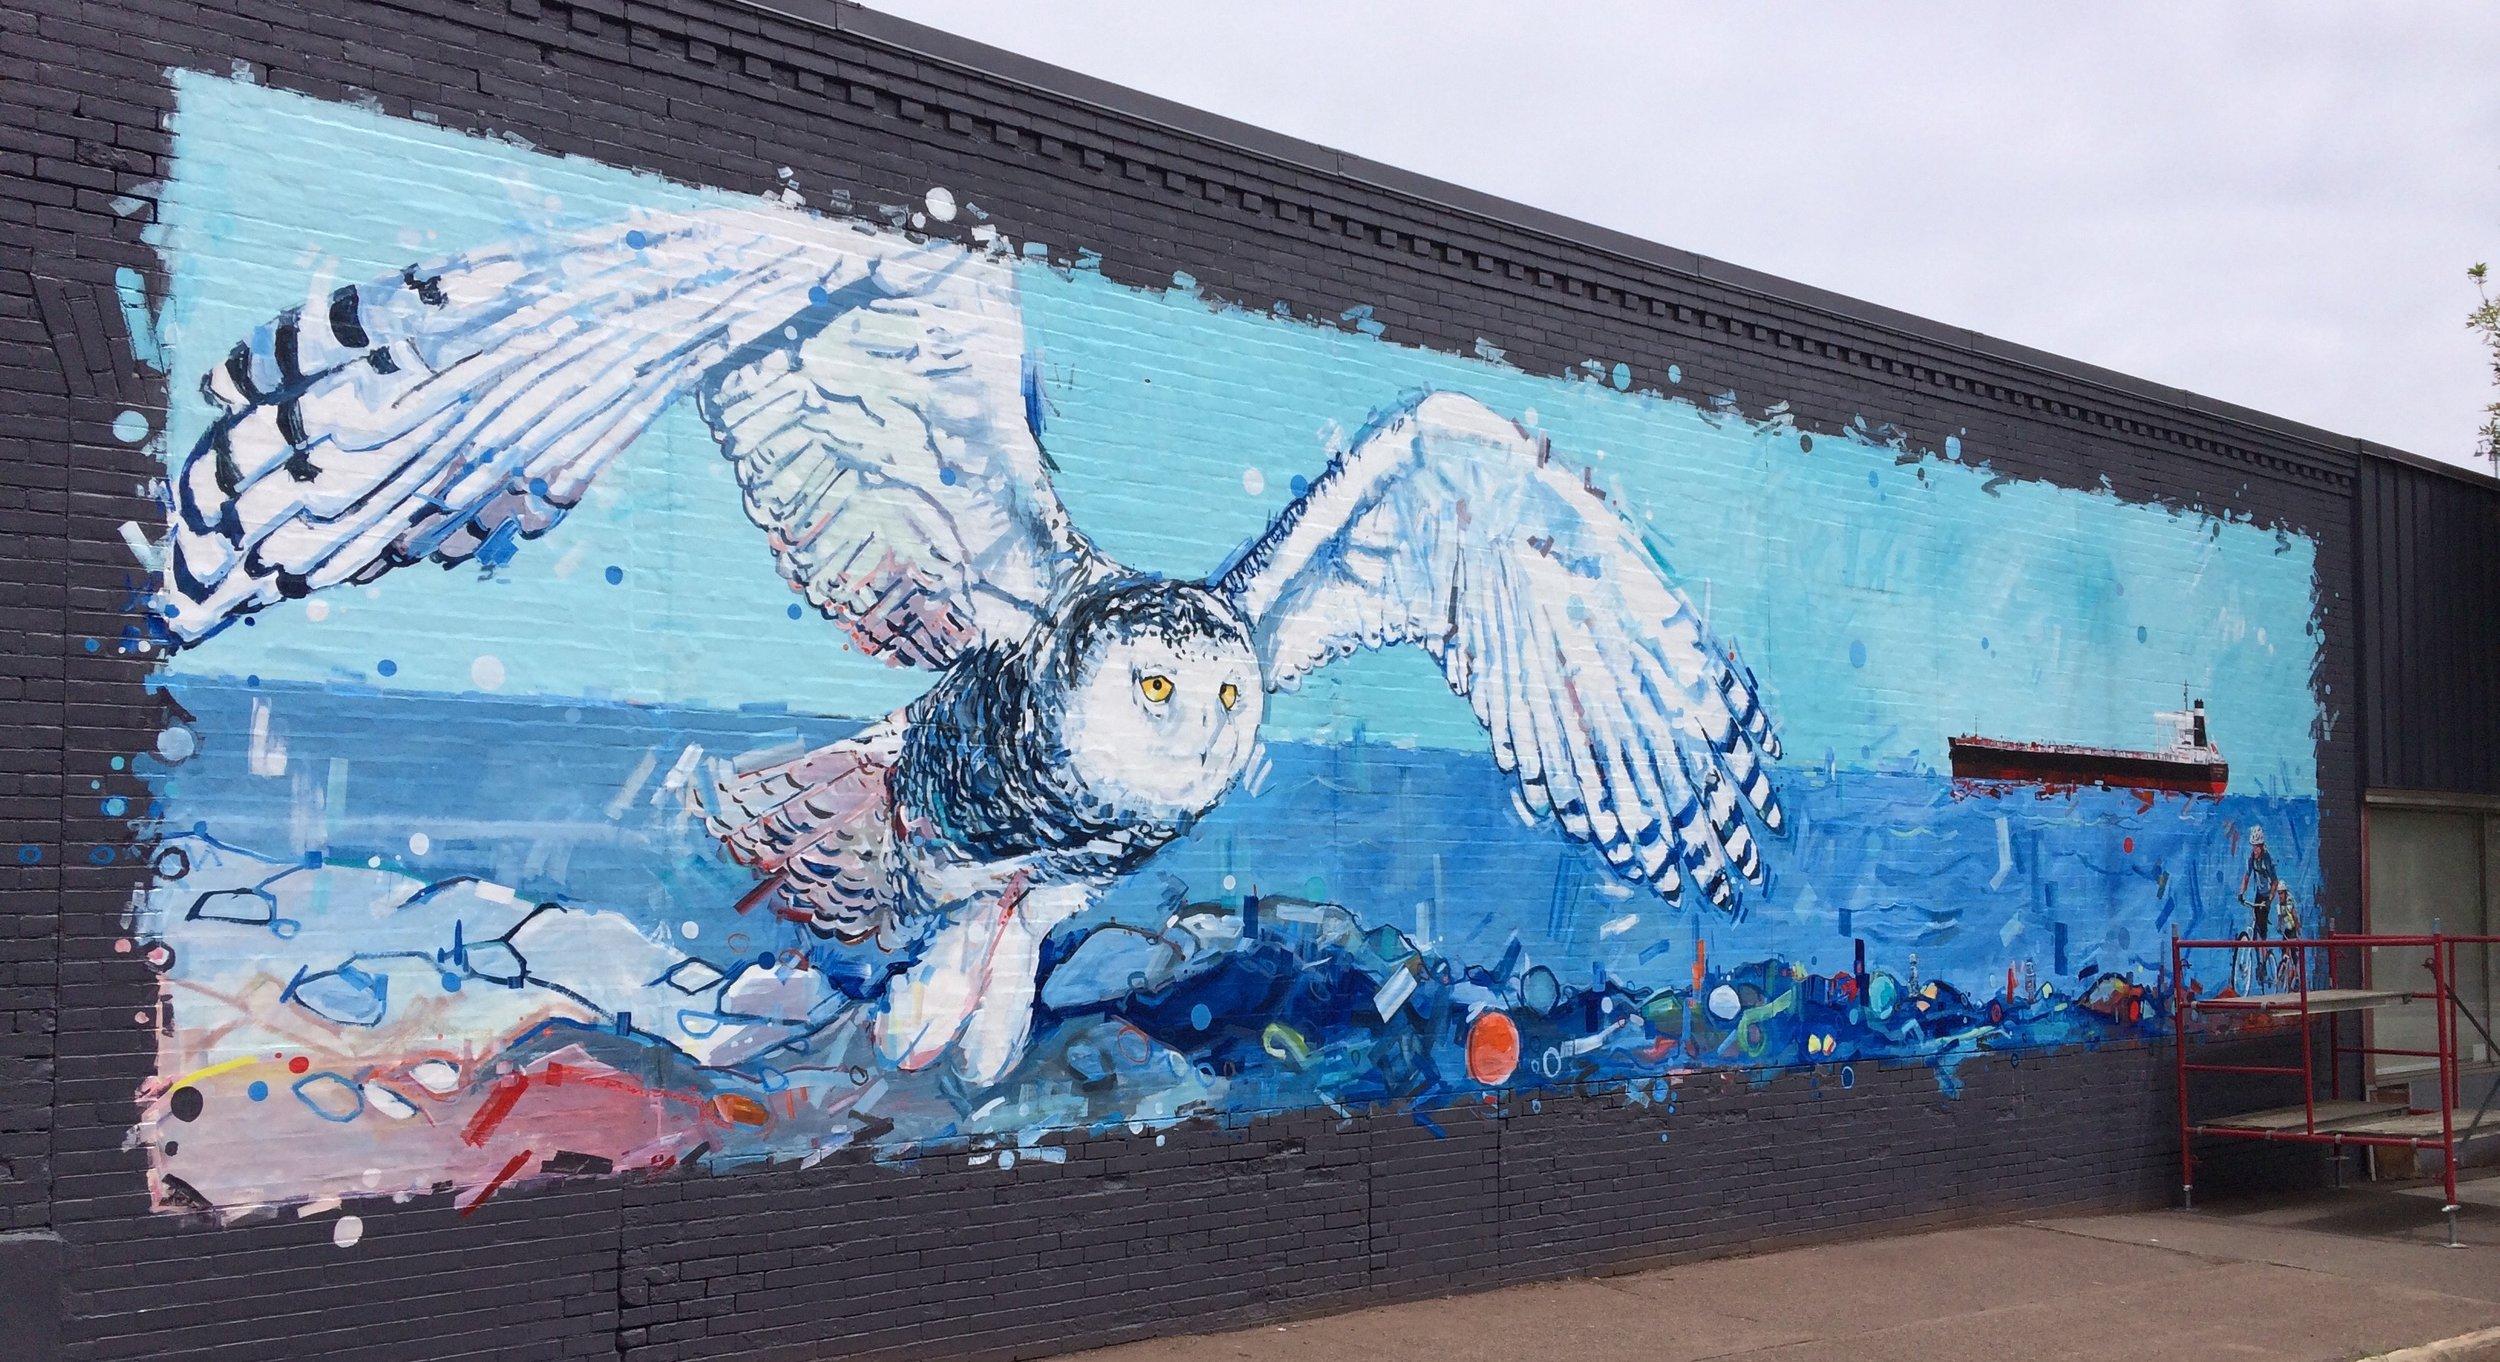 Lincoln Park Mural